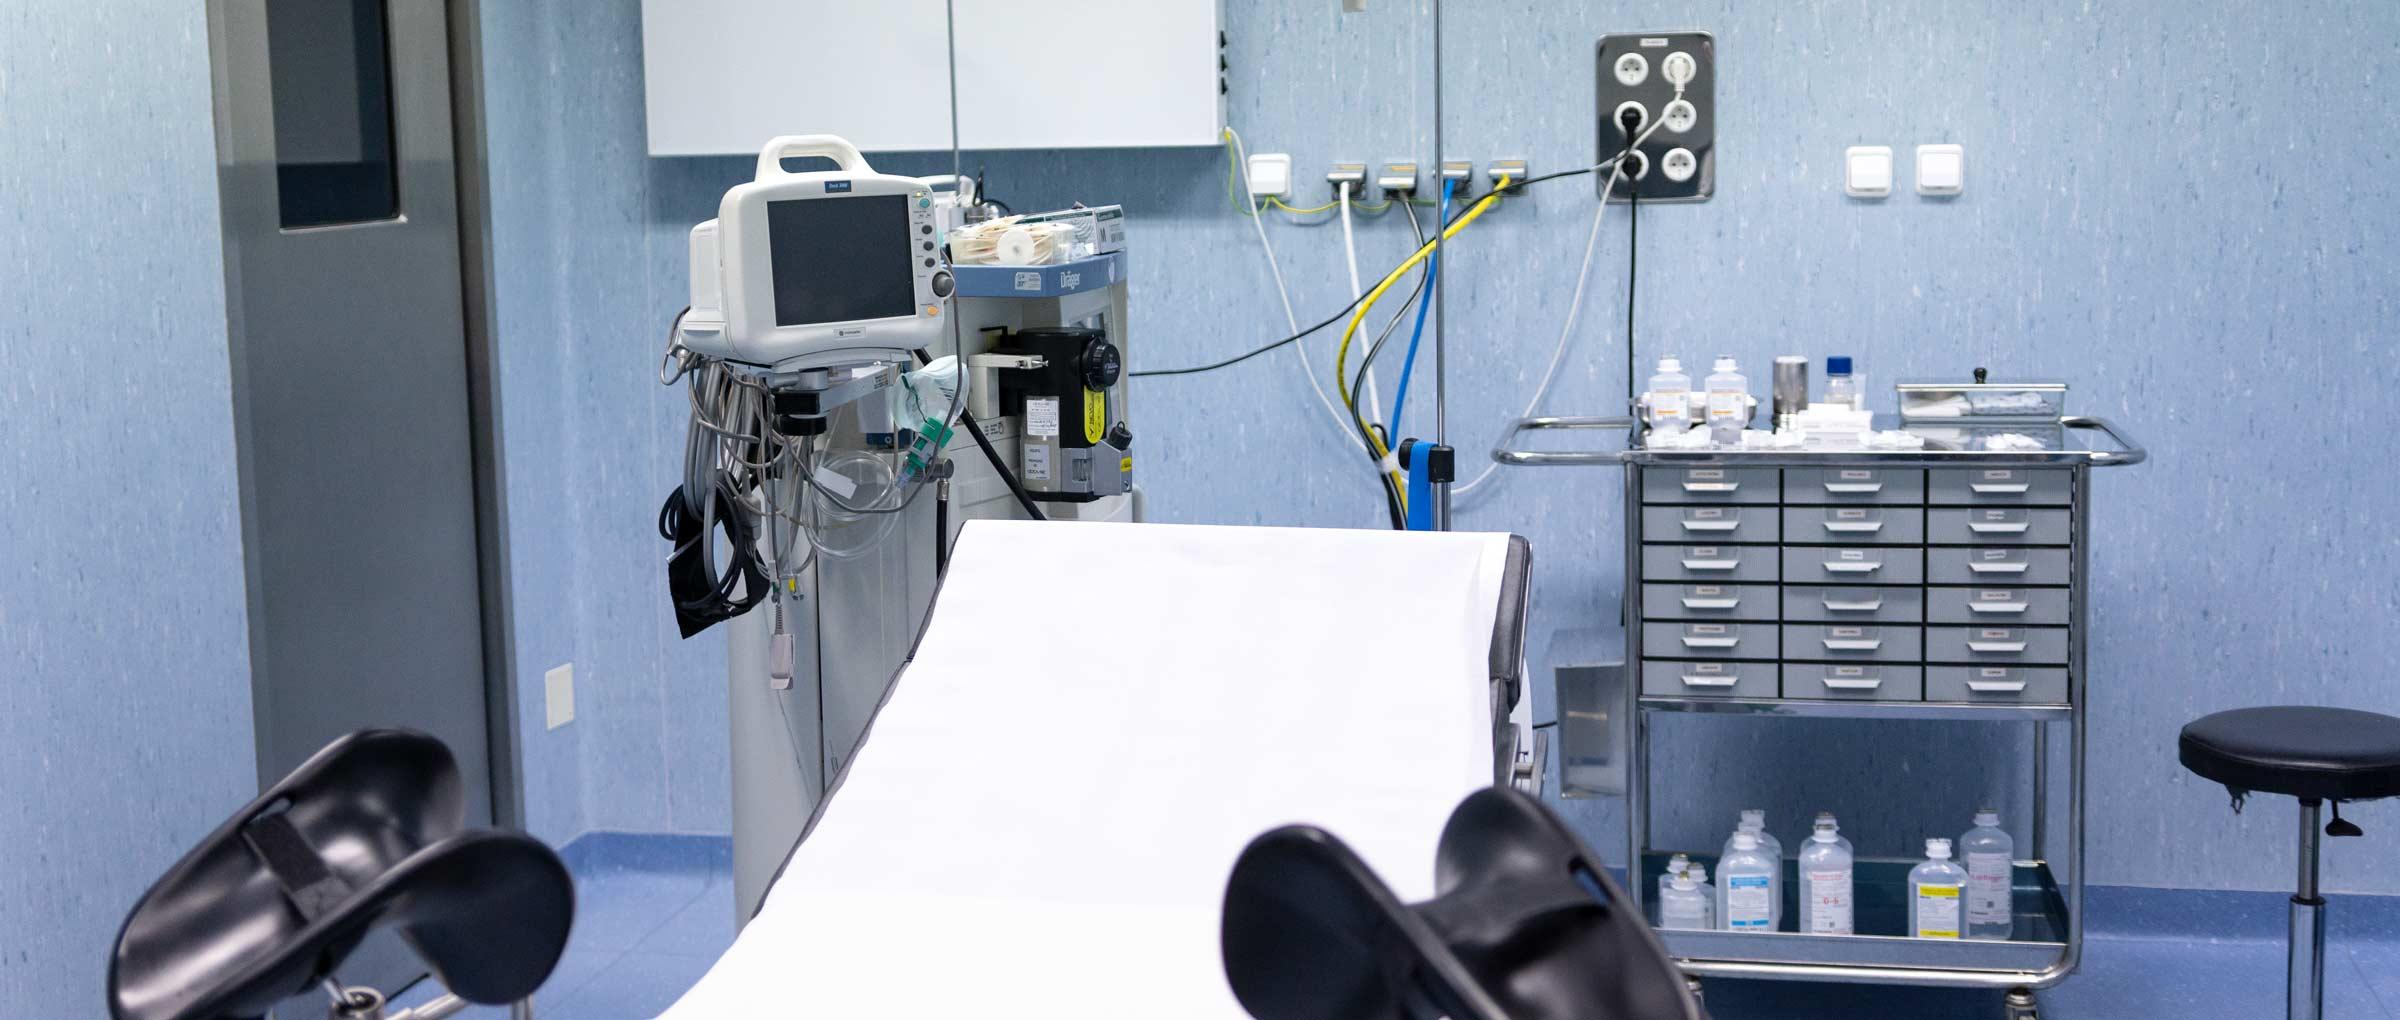 Operating Room of Clínica Tambre